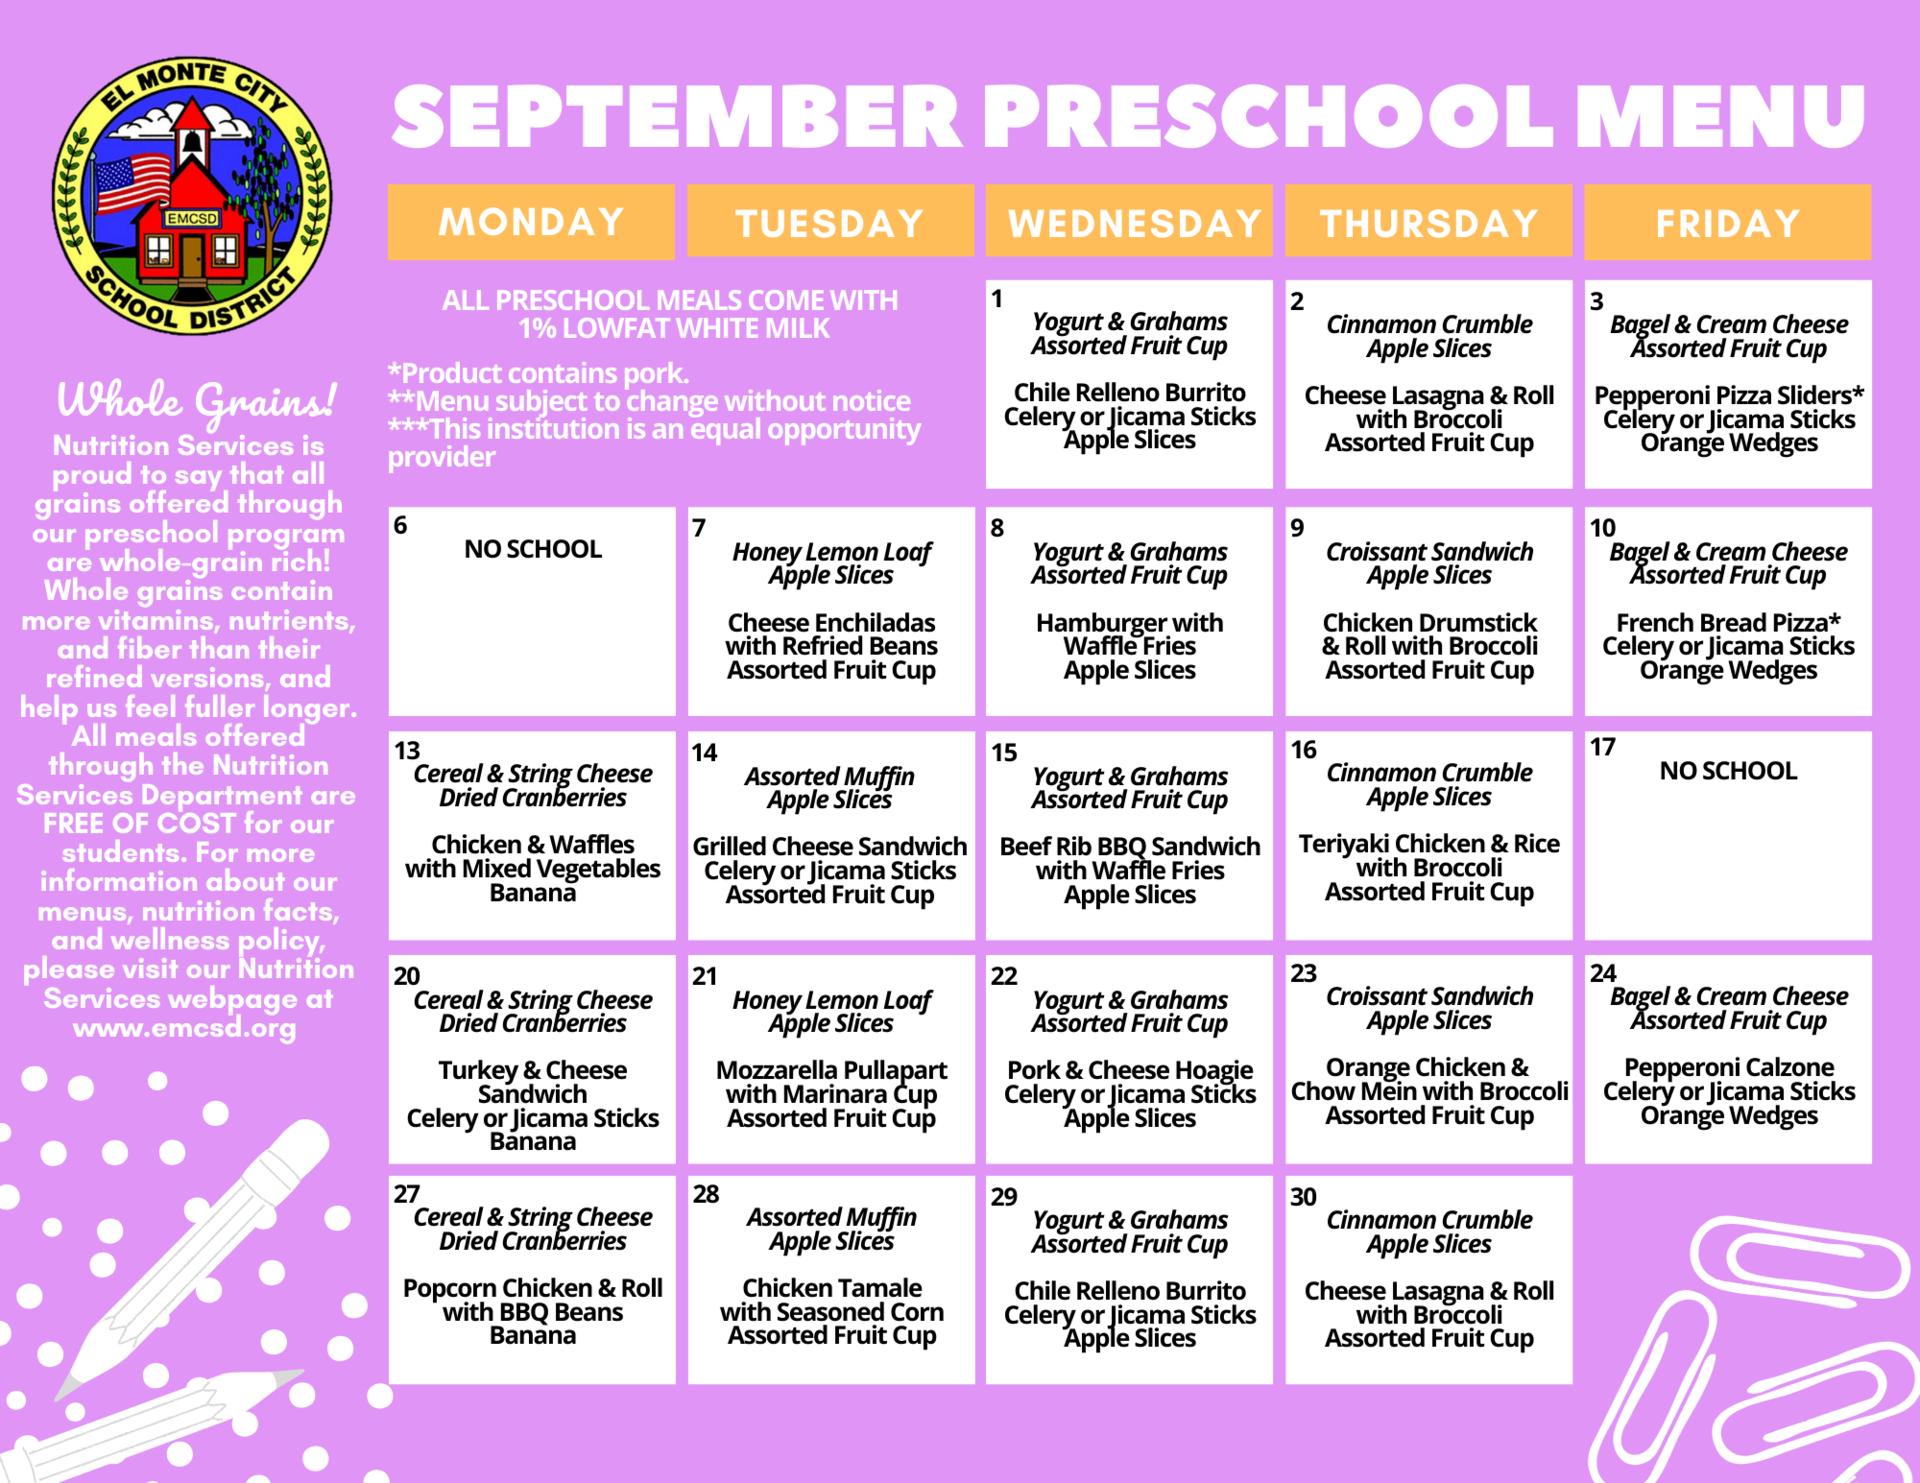 September Preschool Menu